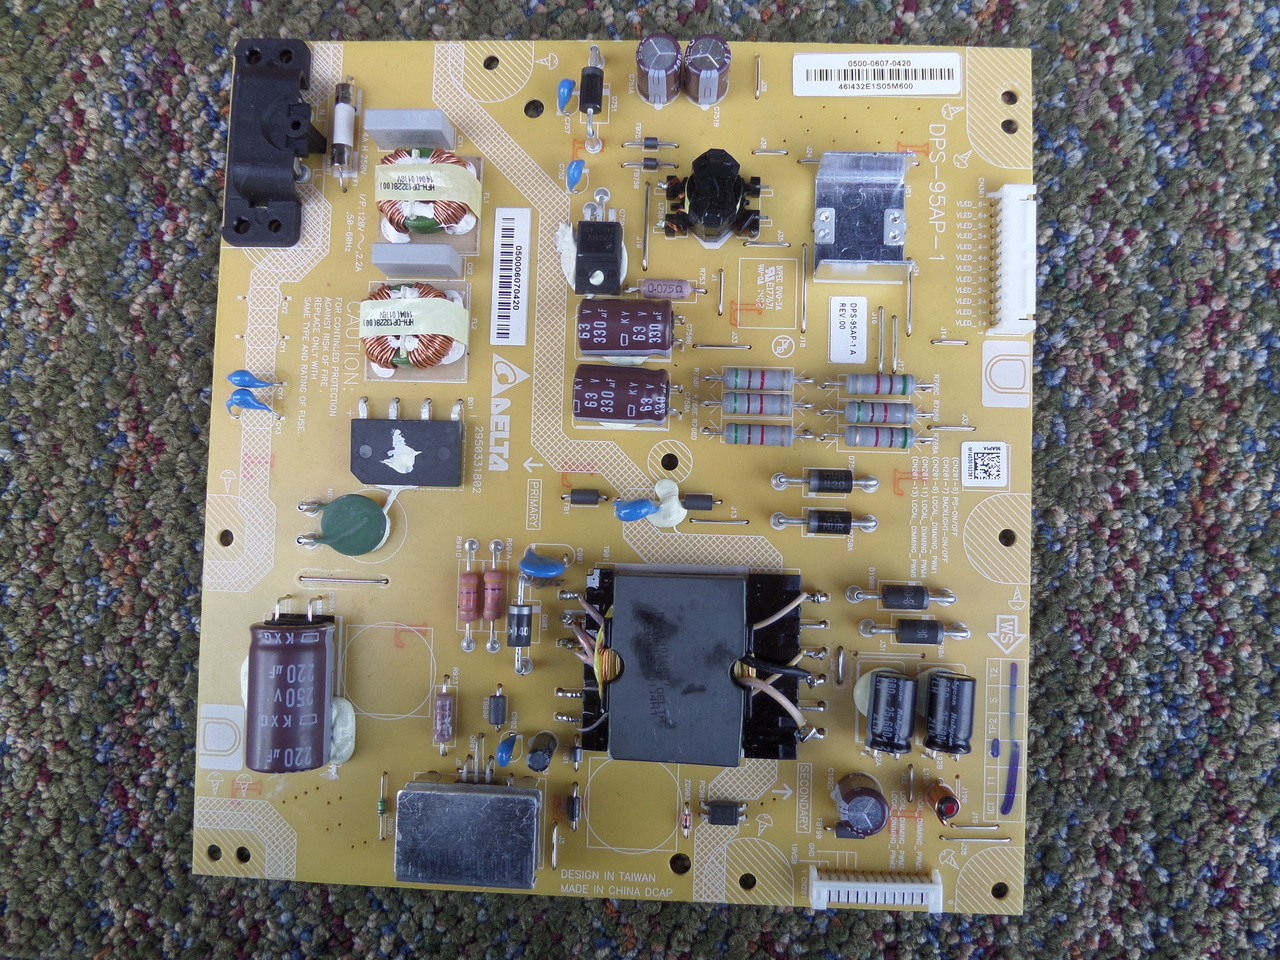 0500-0607-0420, DPS-95AP-1 Vizio Power Supply / LED Board